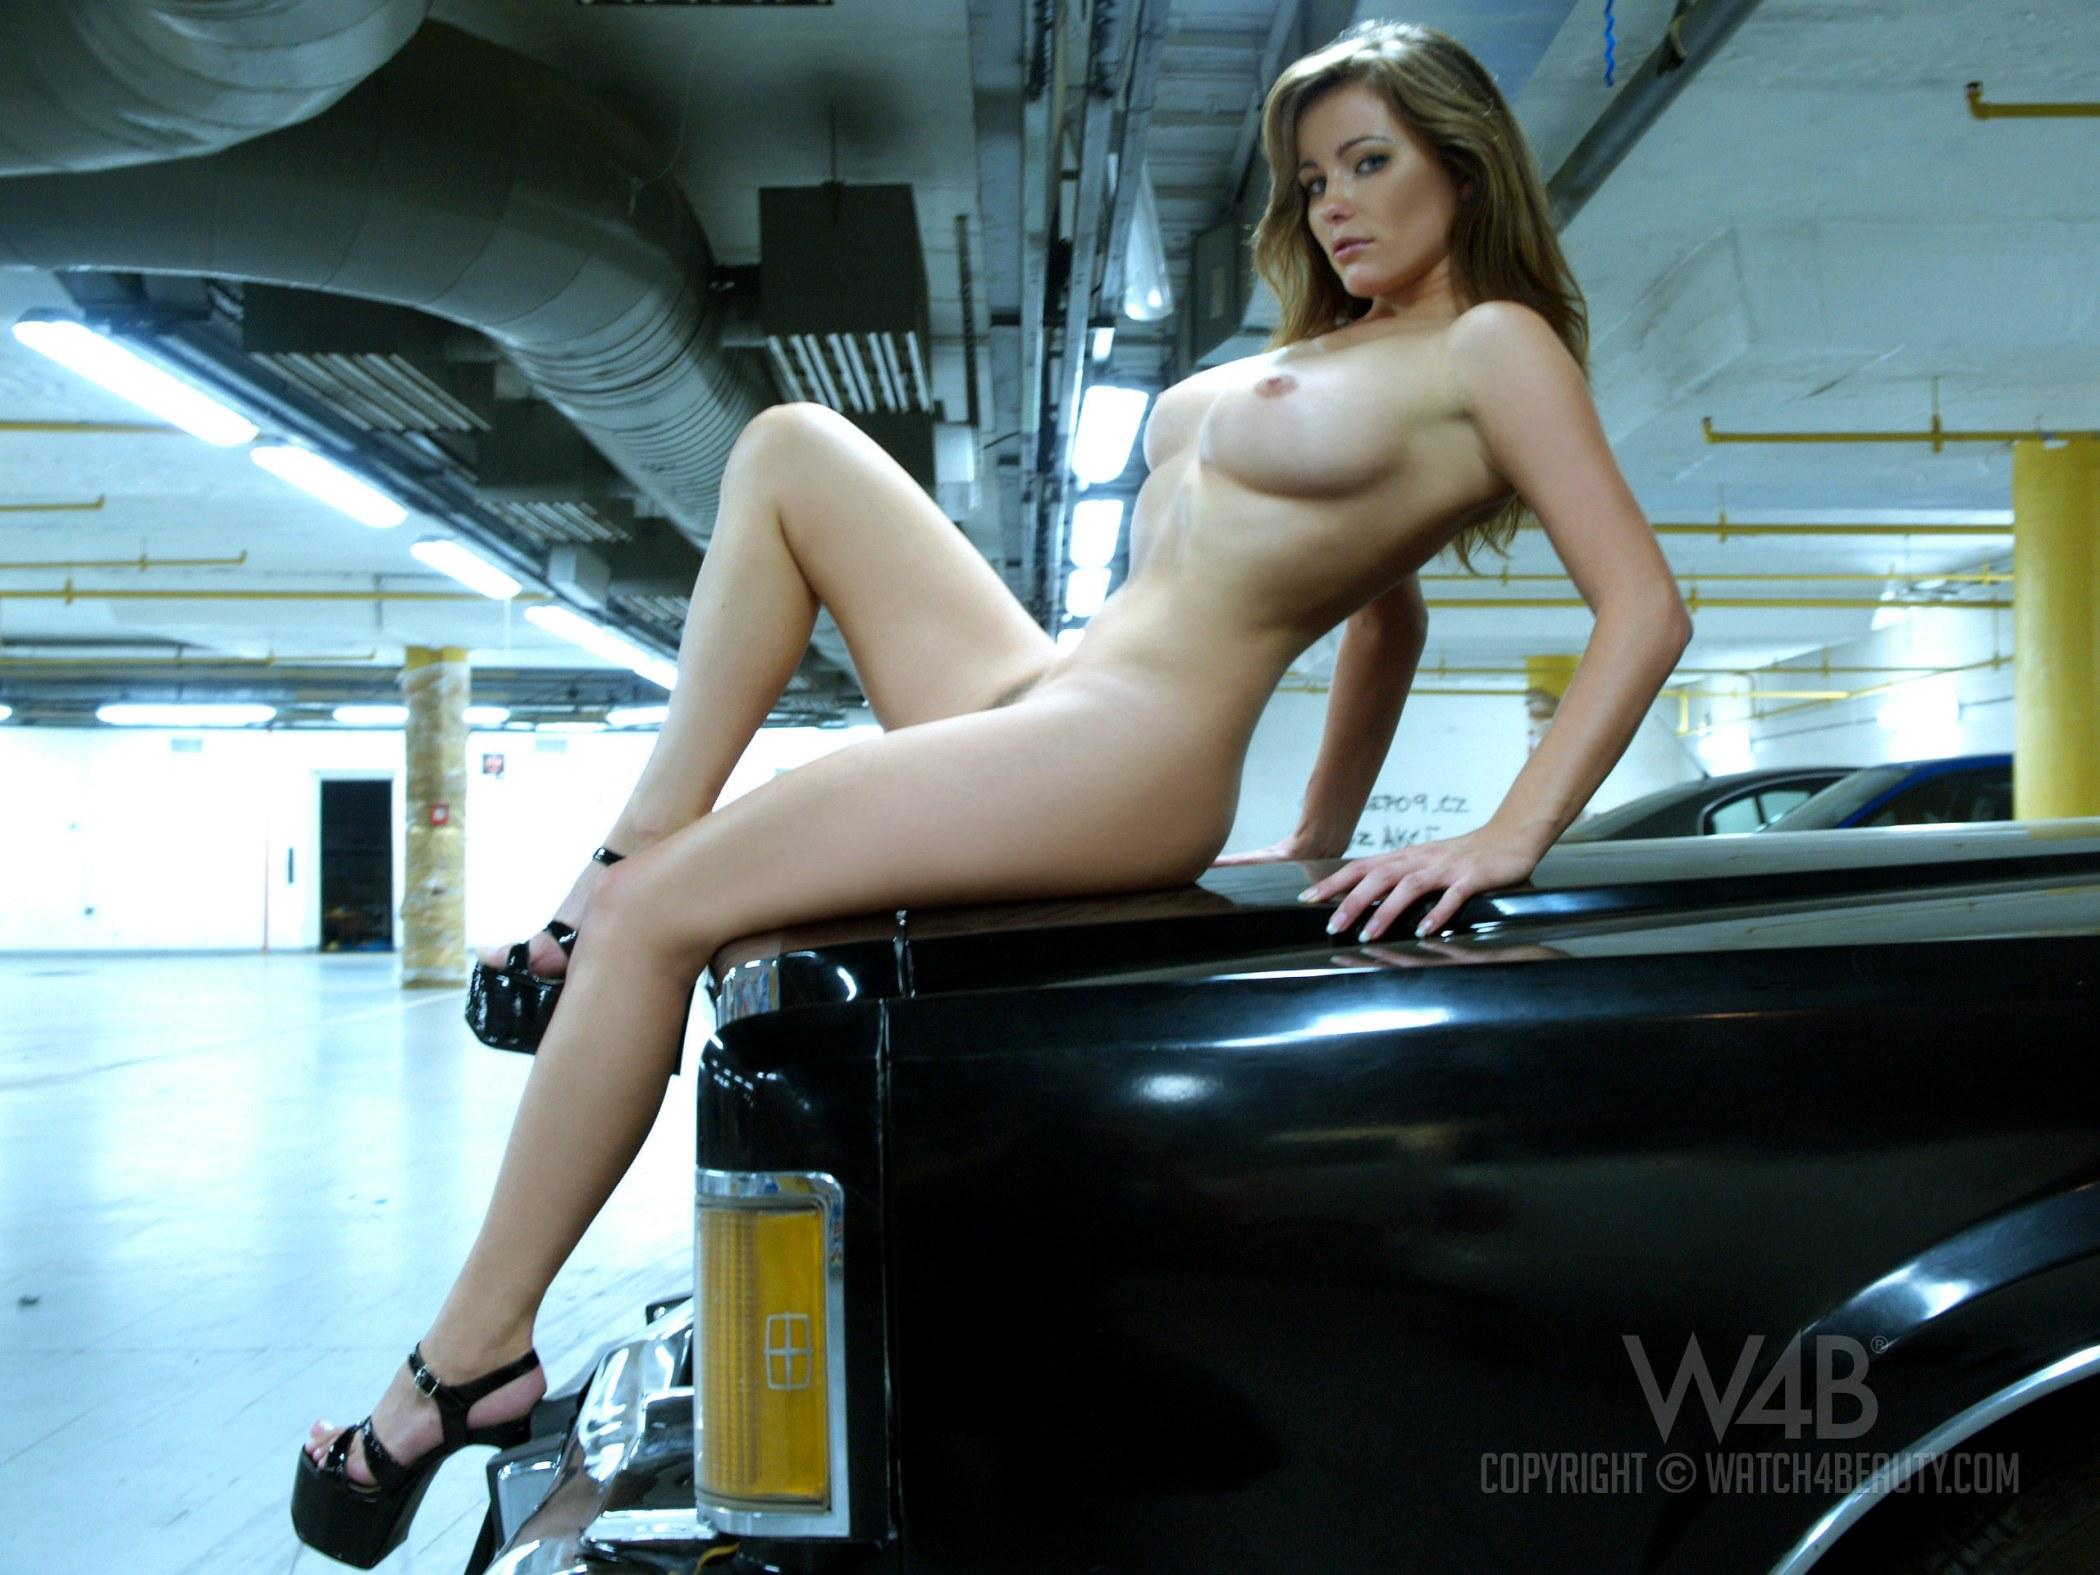 Голая сидит в автомобиле фото 138-341